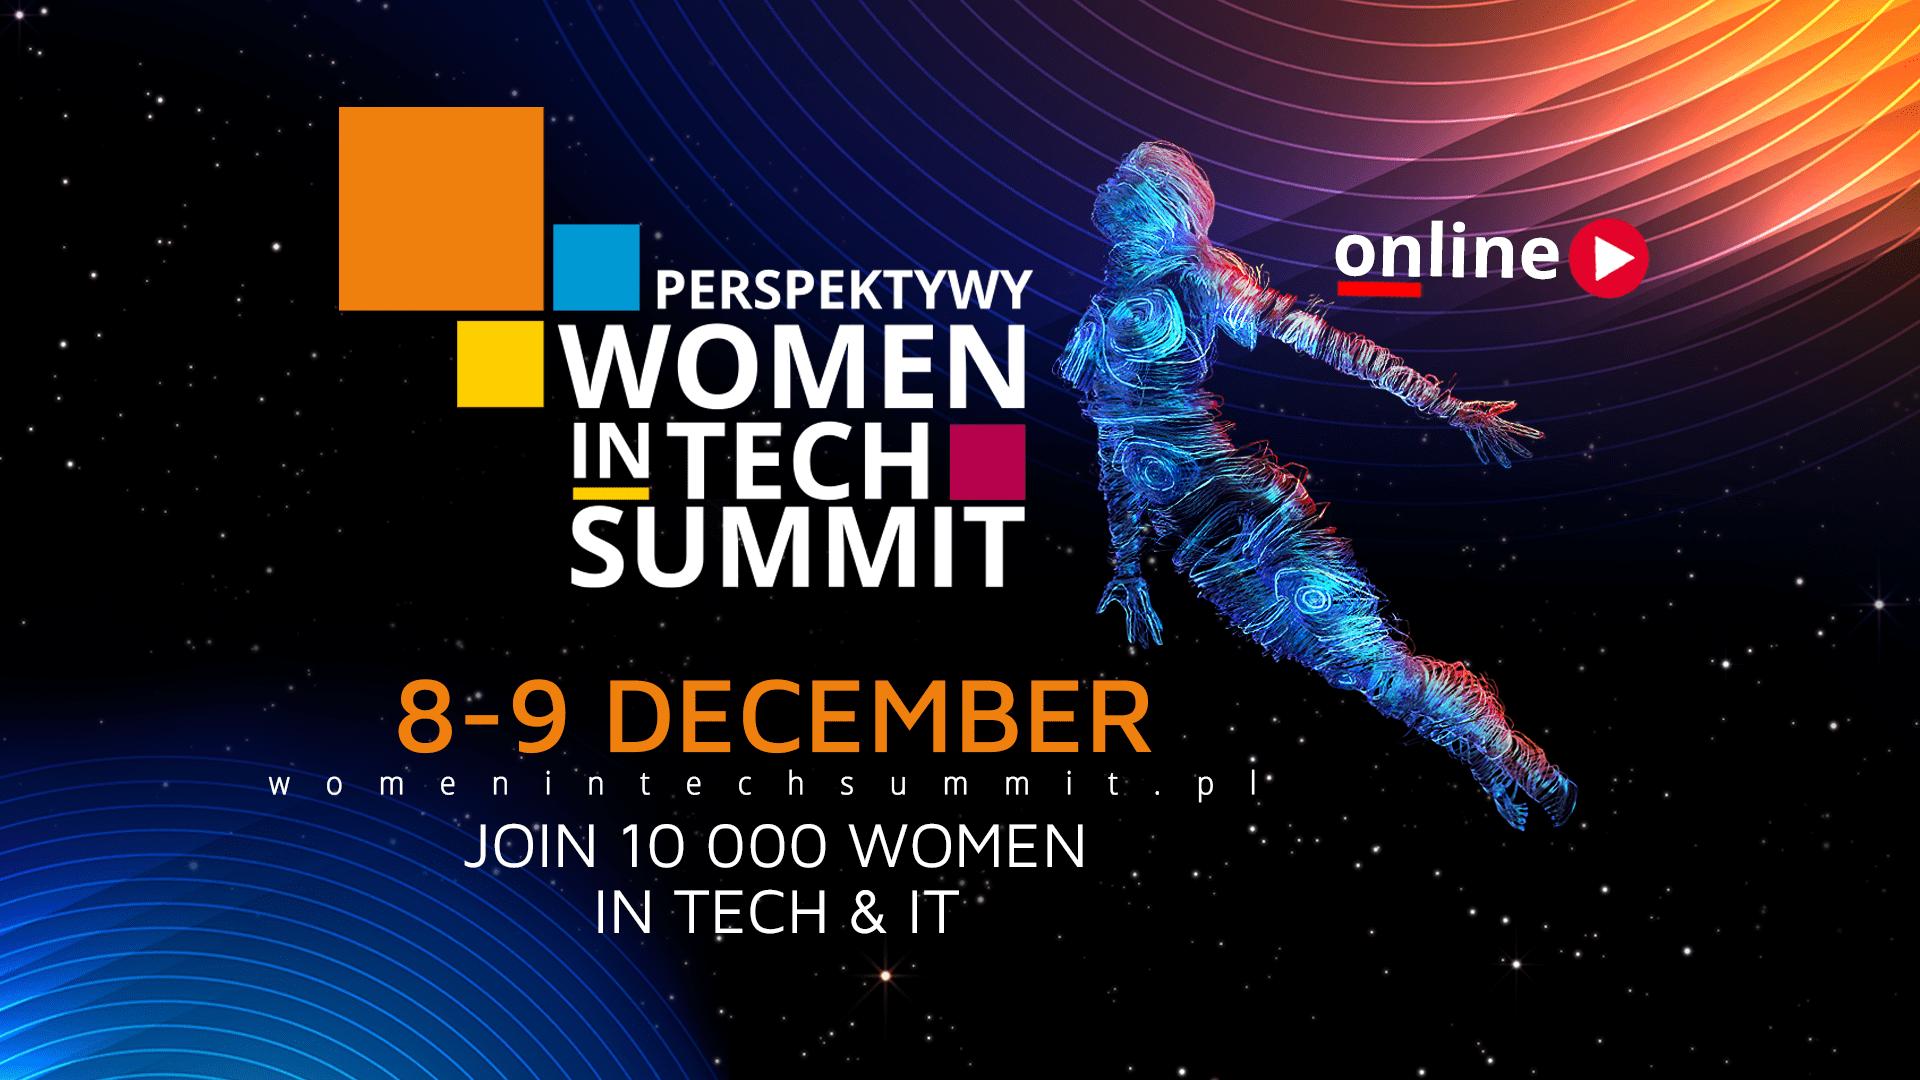 Perspektywy Women in Tech Summit pod patronatem e-Izby